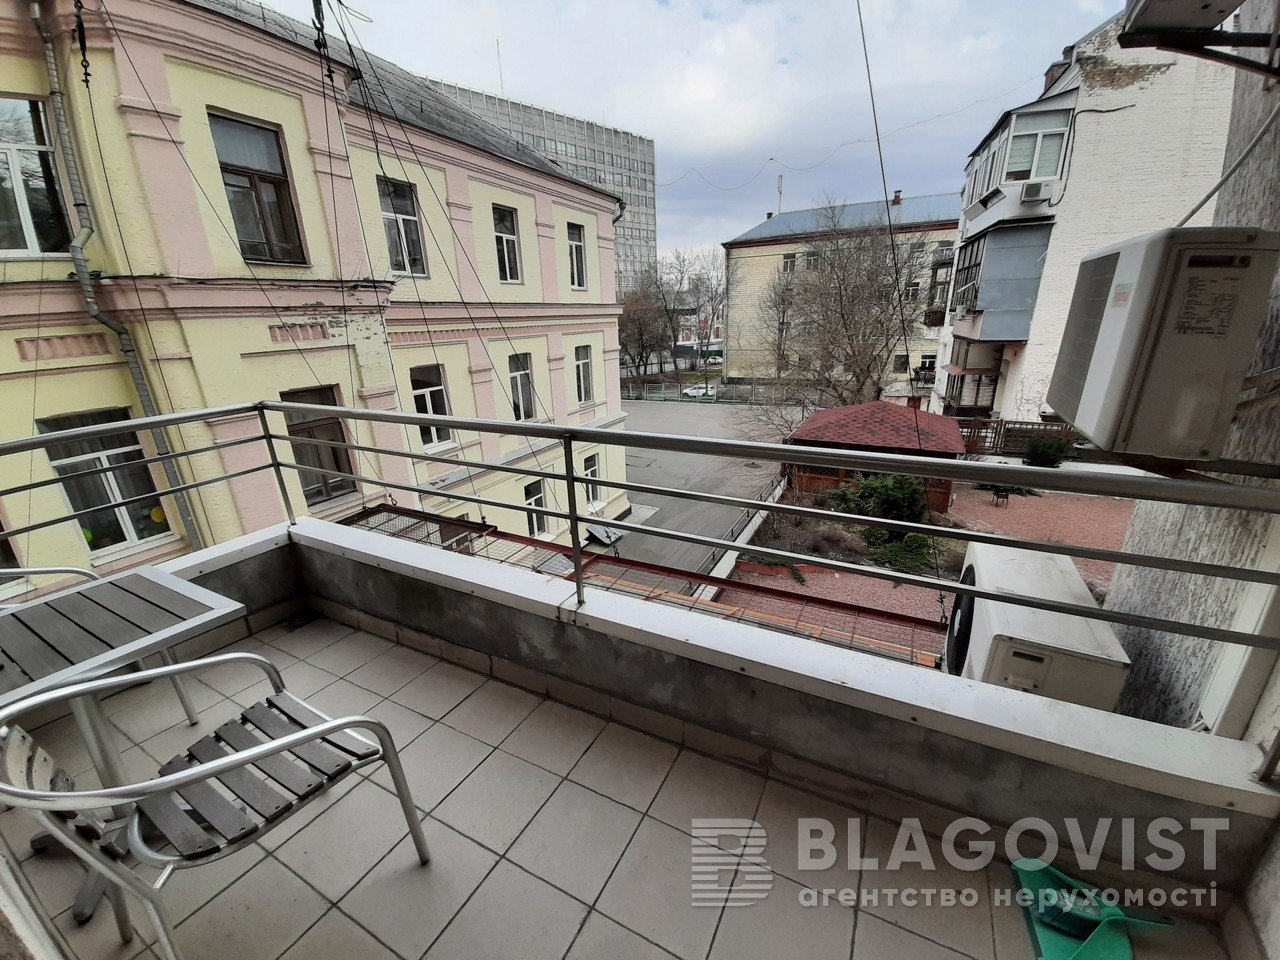 Квартира P-9079, Бутышев пер. (Иванова Андрея), 13, Киев - Фото 31